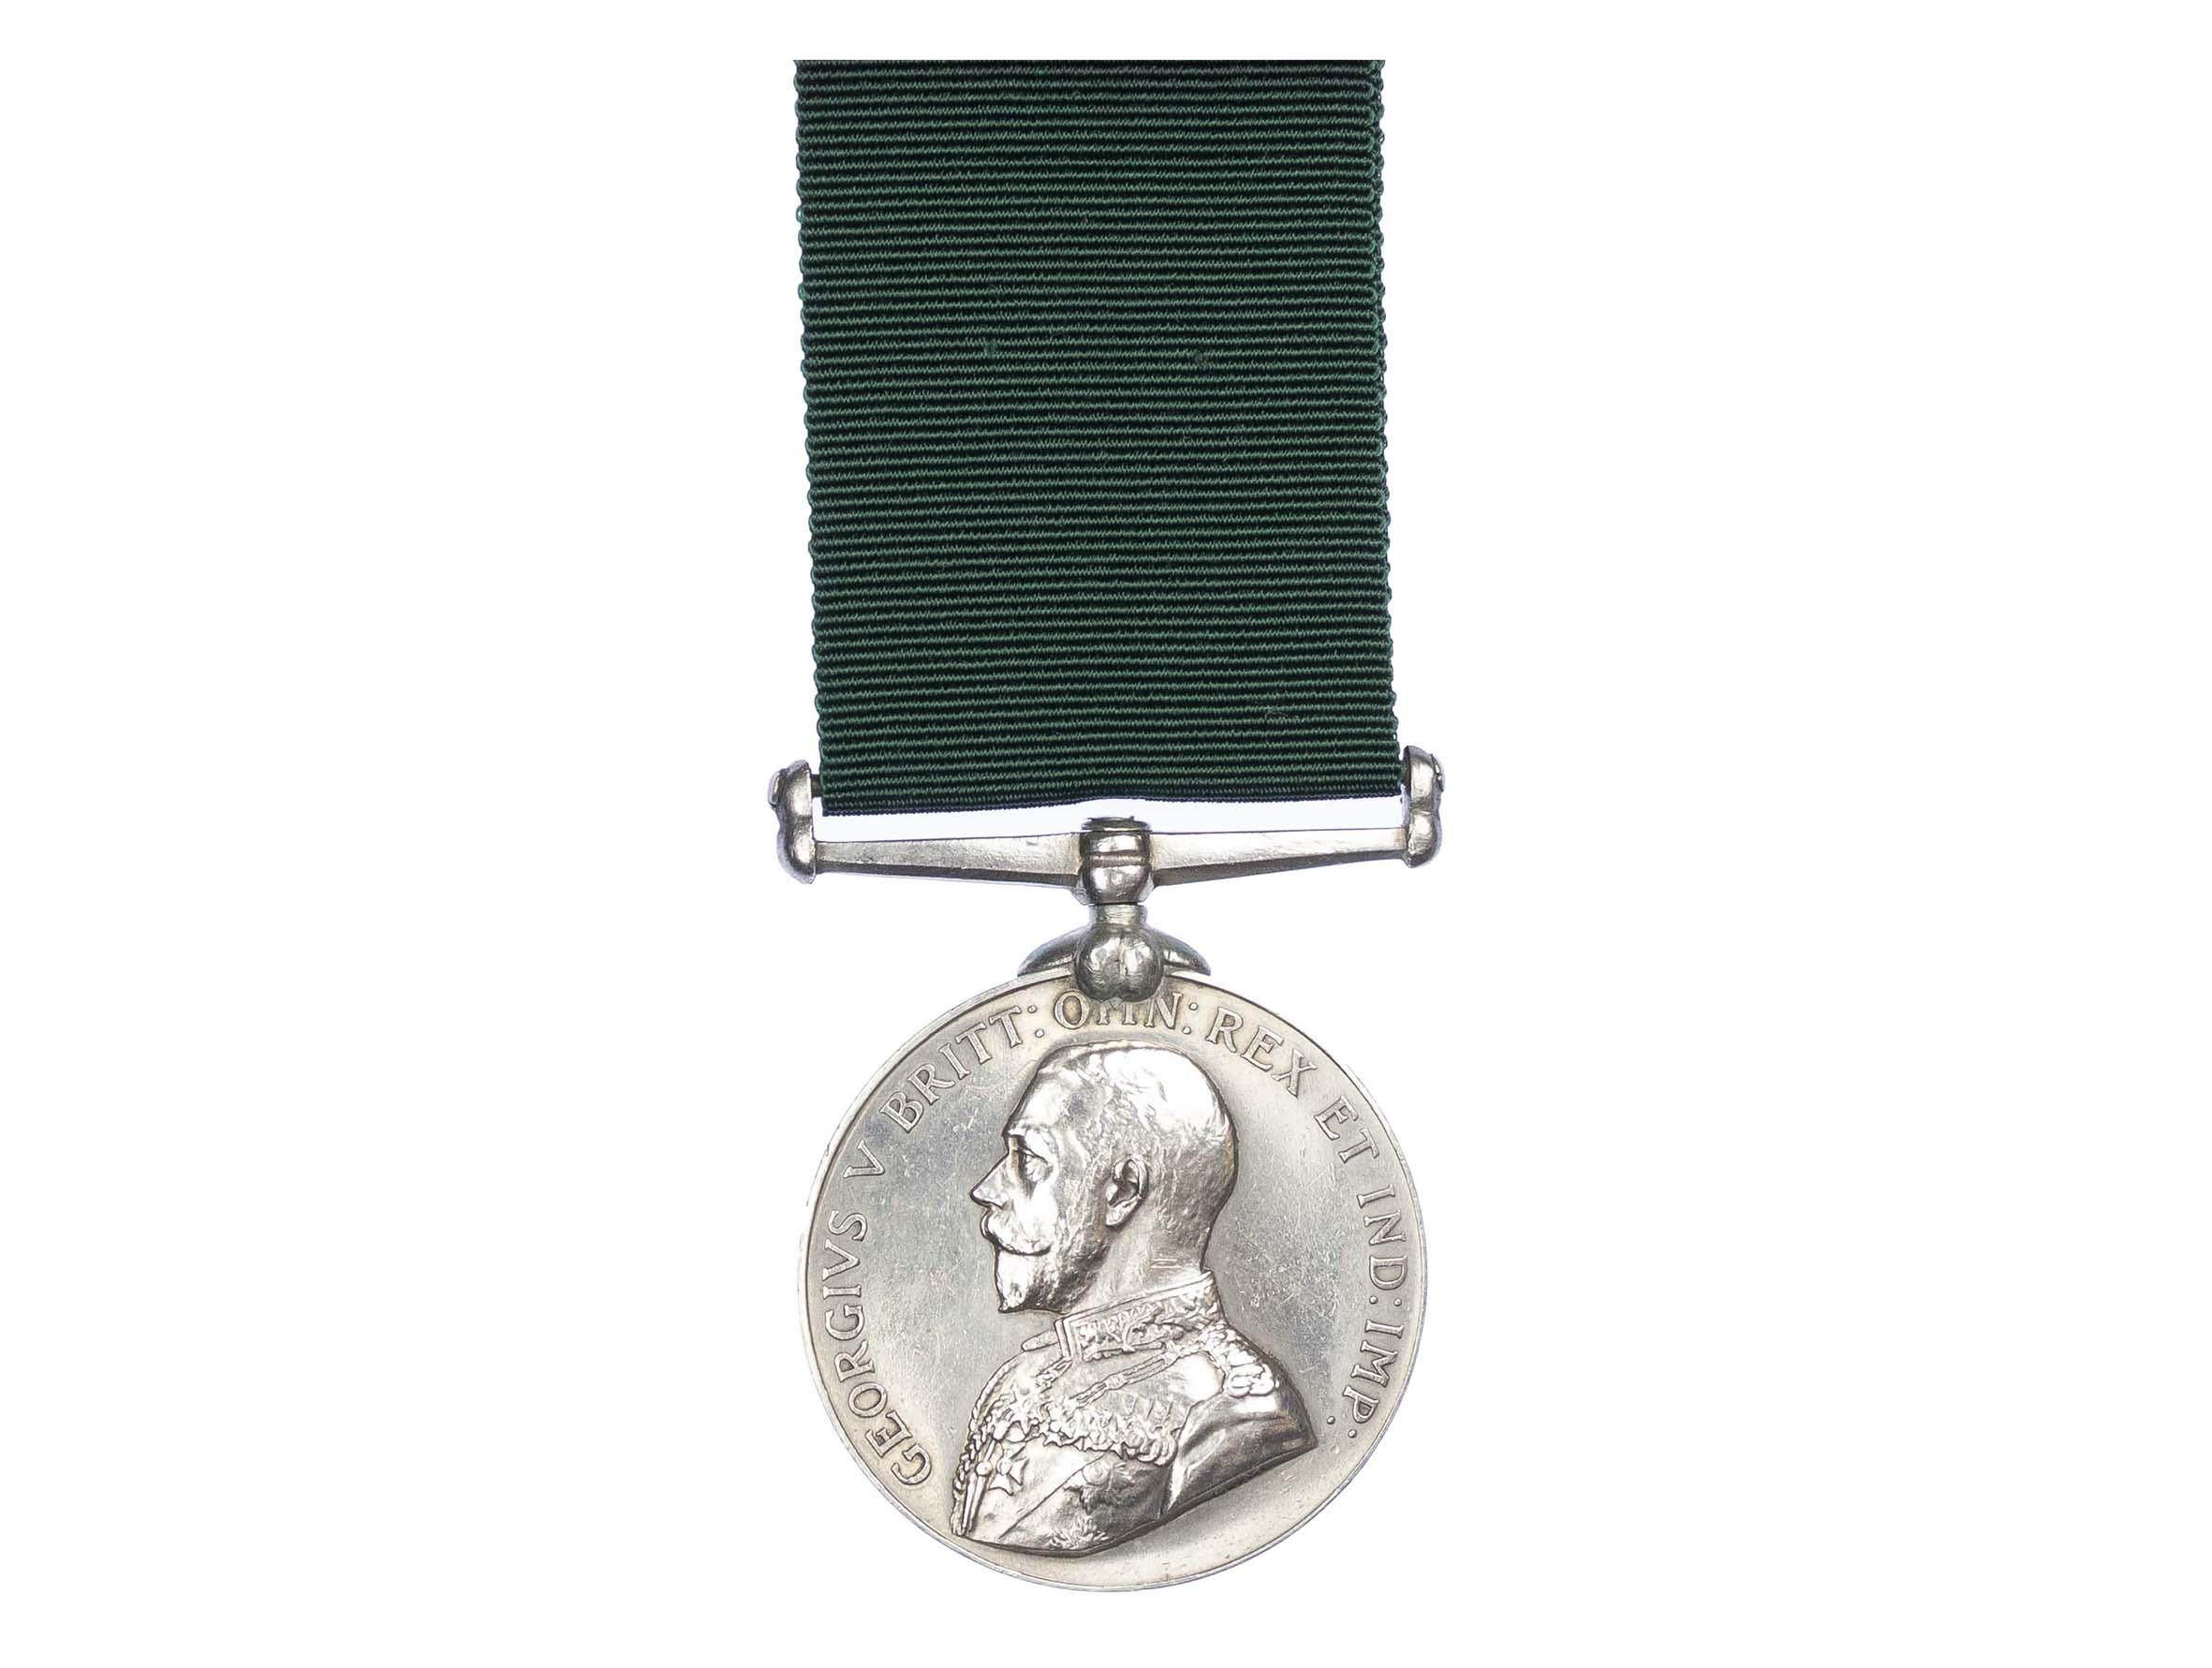 Volunteer Force Long Service Medal, GVR, to Private J. Weyman-Jones